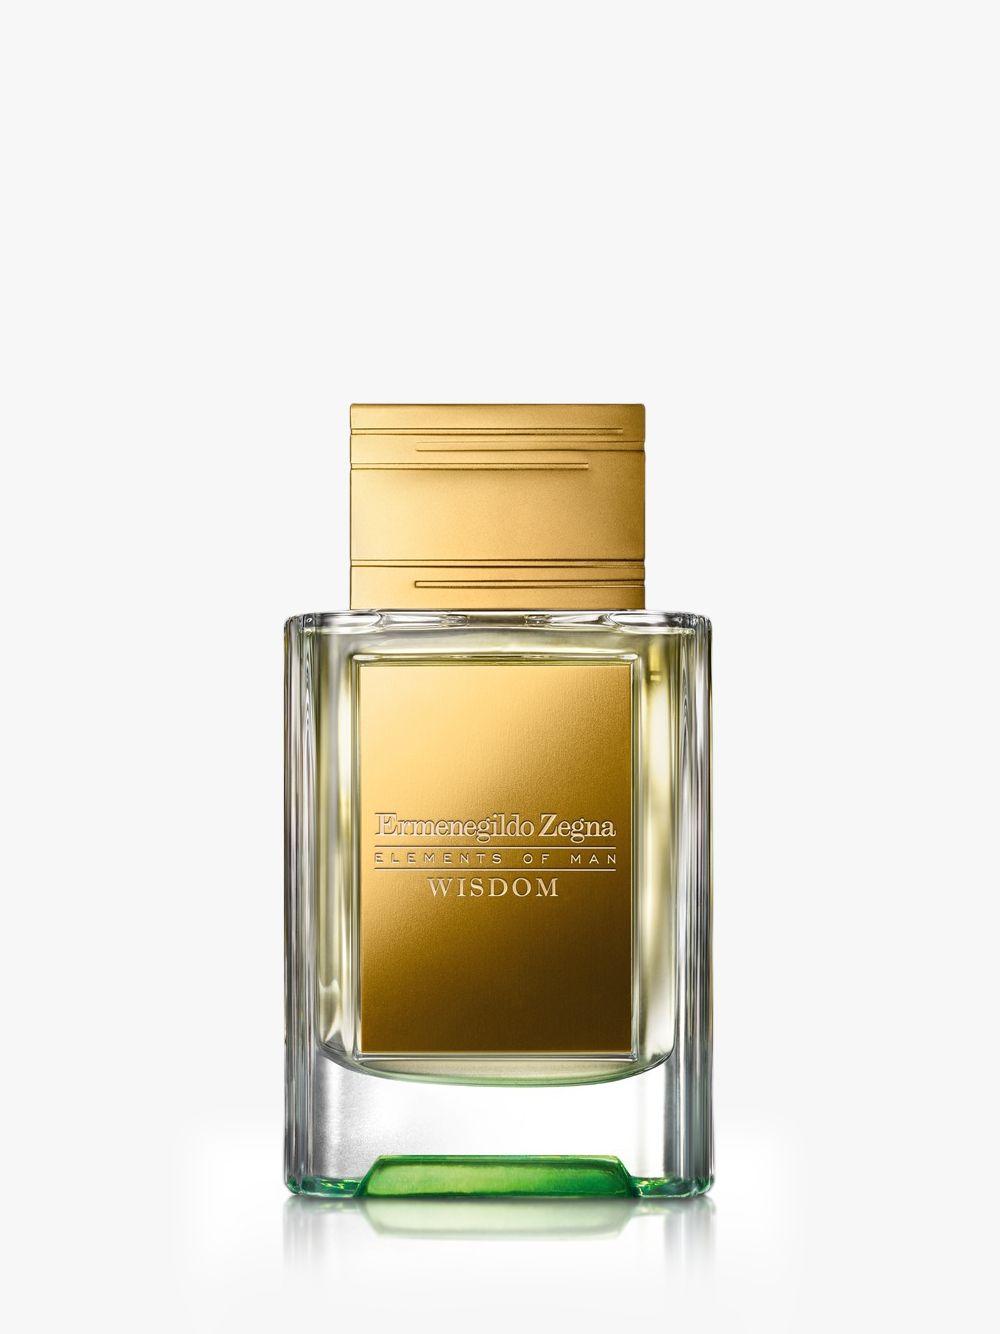 Ermenegildo Zegna Ermenegildo Zegna Elements of Man Wisdom Concentrate de Parfum, 50ml